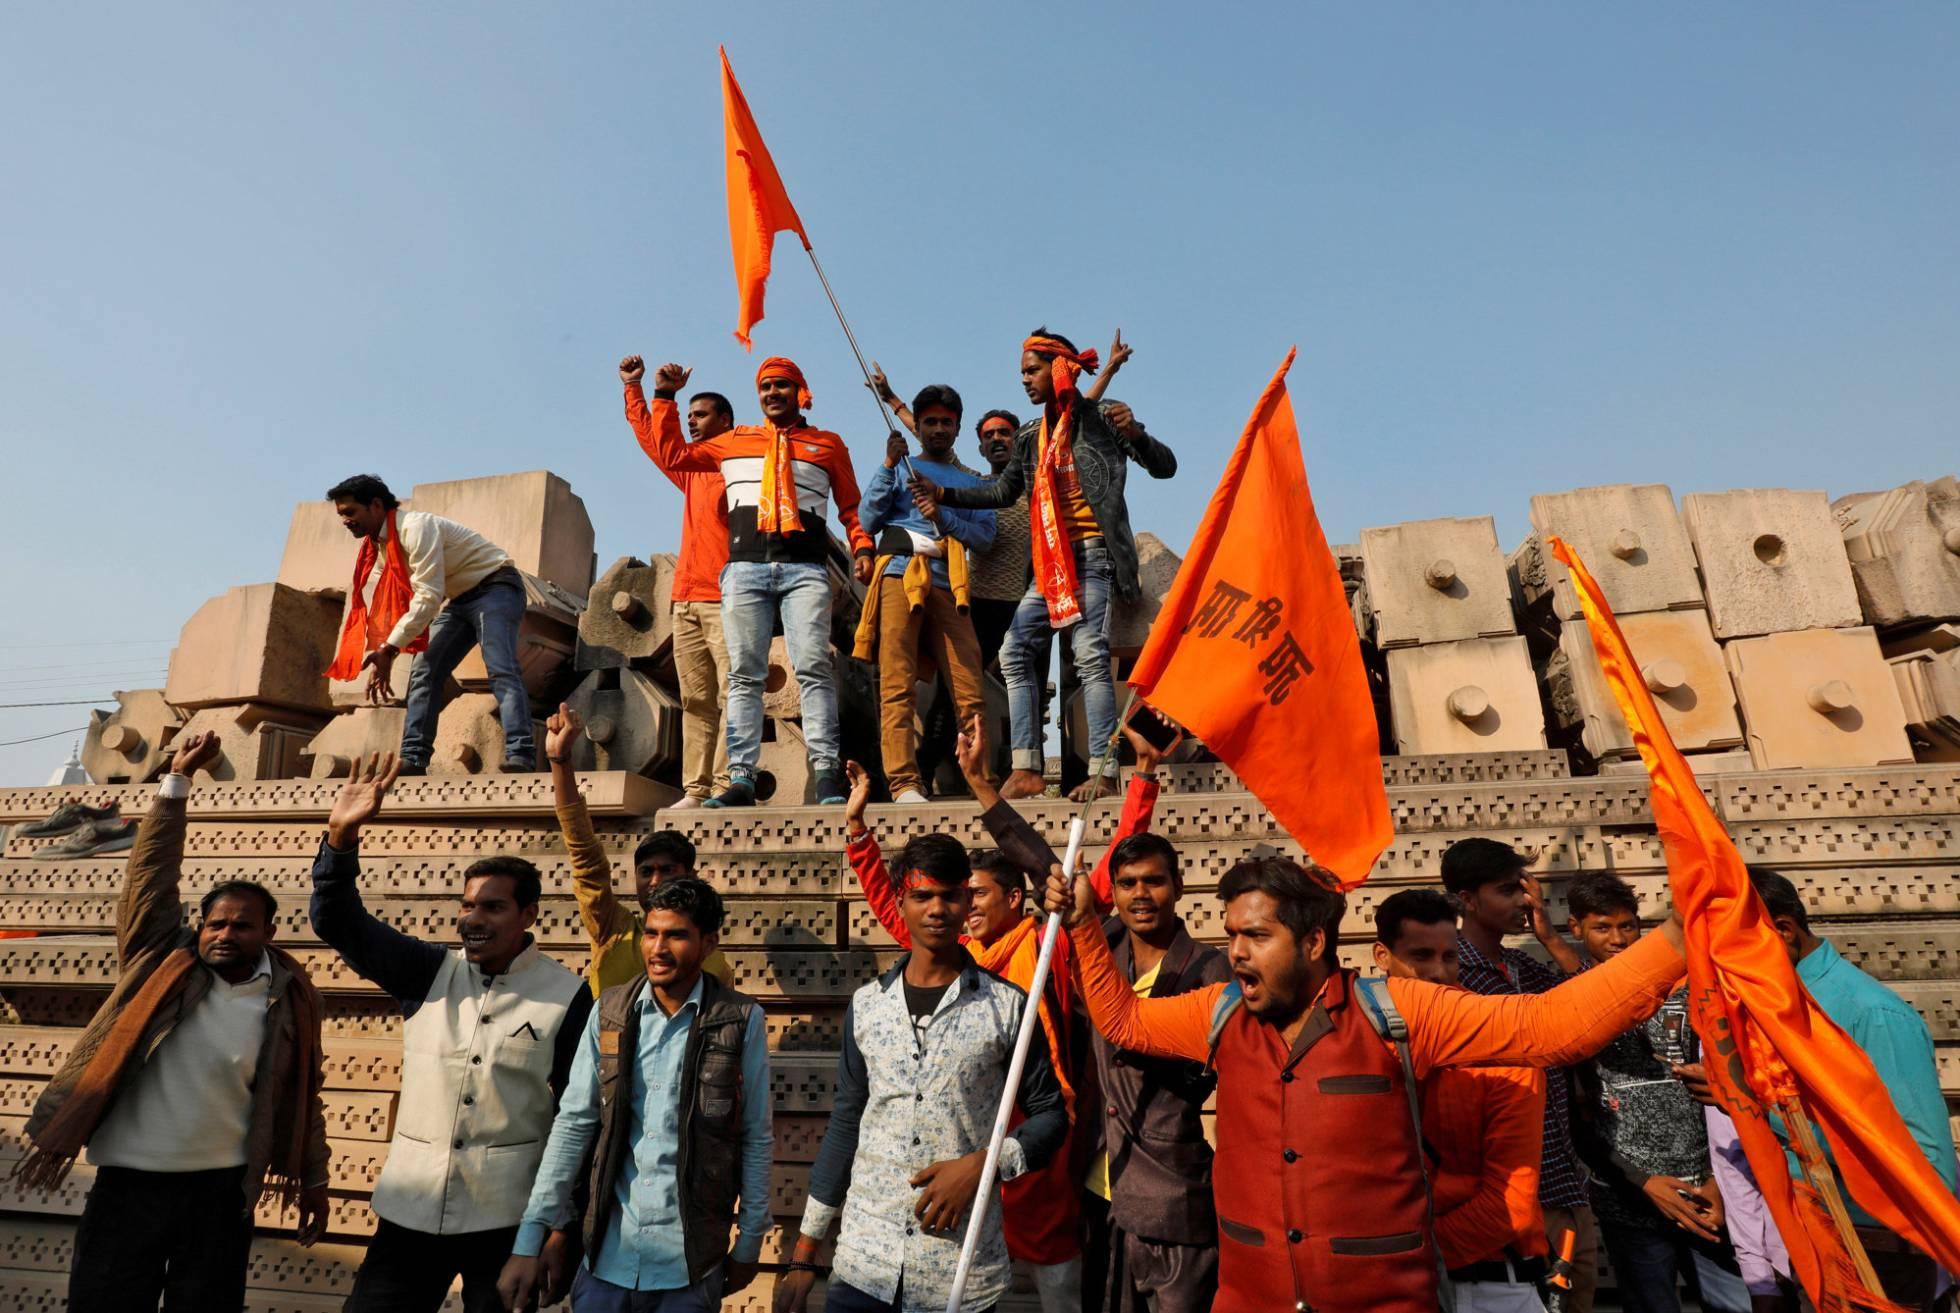 India, un país peligroso para los cristianos